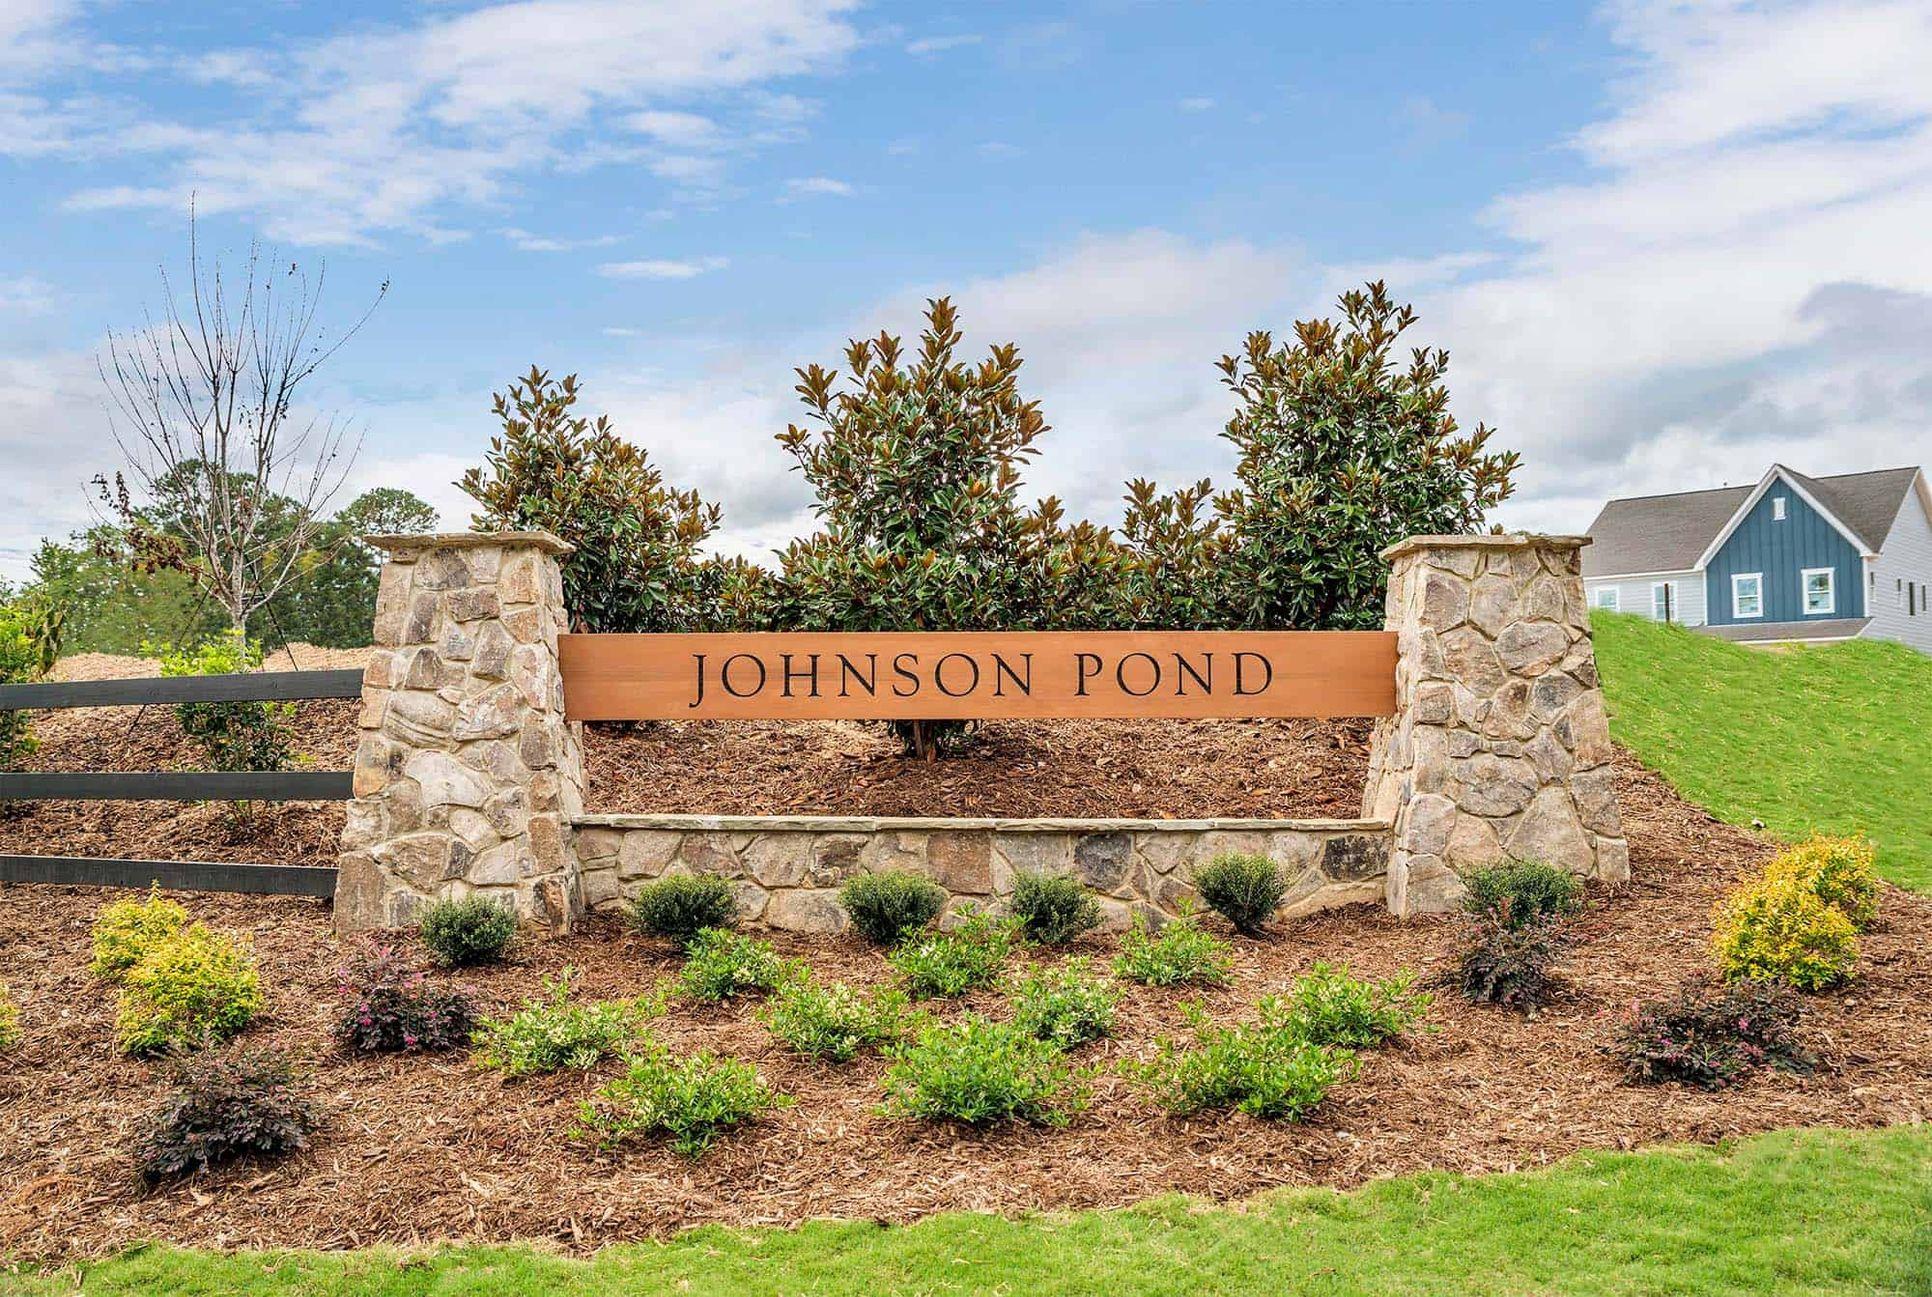 Johnson Pond Entry Monument